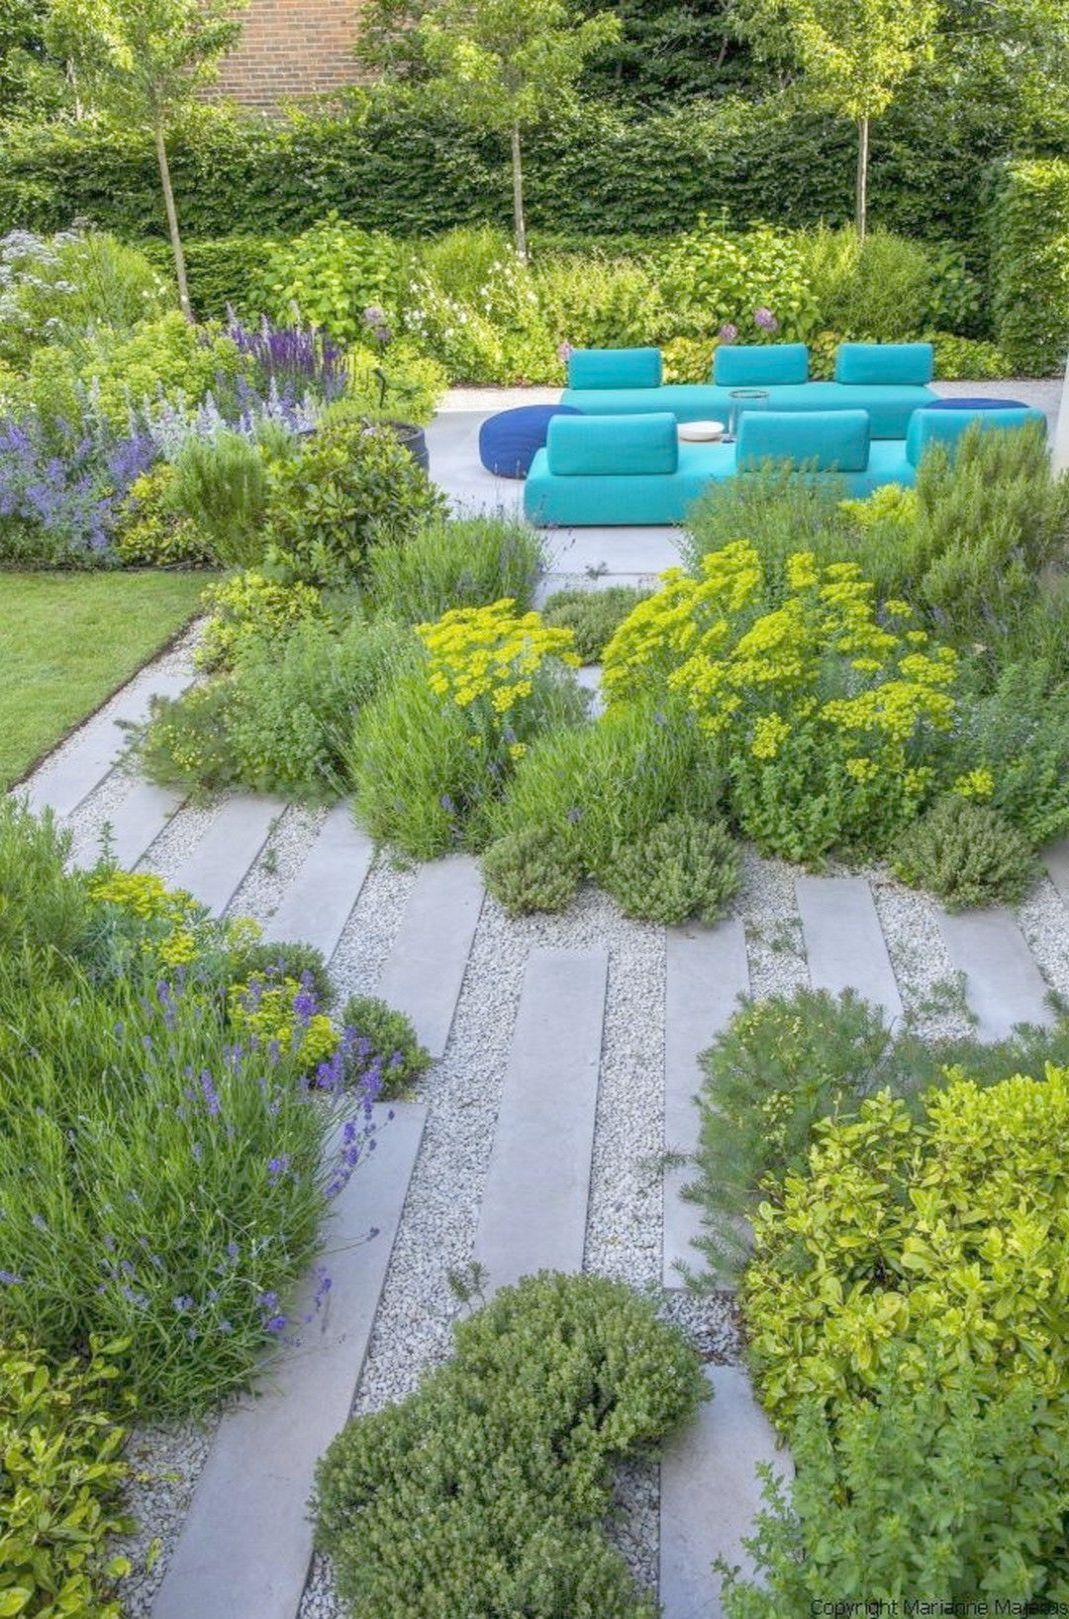 Landscape Gardening Courses East Sussex Modern Landscape Design Near Me Modern Landschapsontwerp Modern Tuinontwerp Landschapsarchitectuur Ontwerp